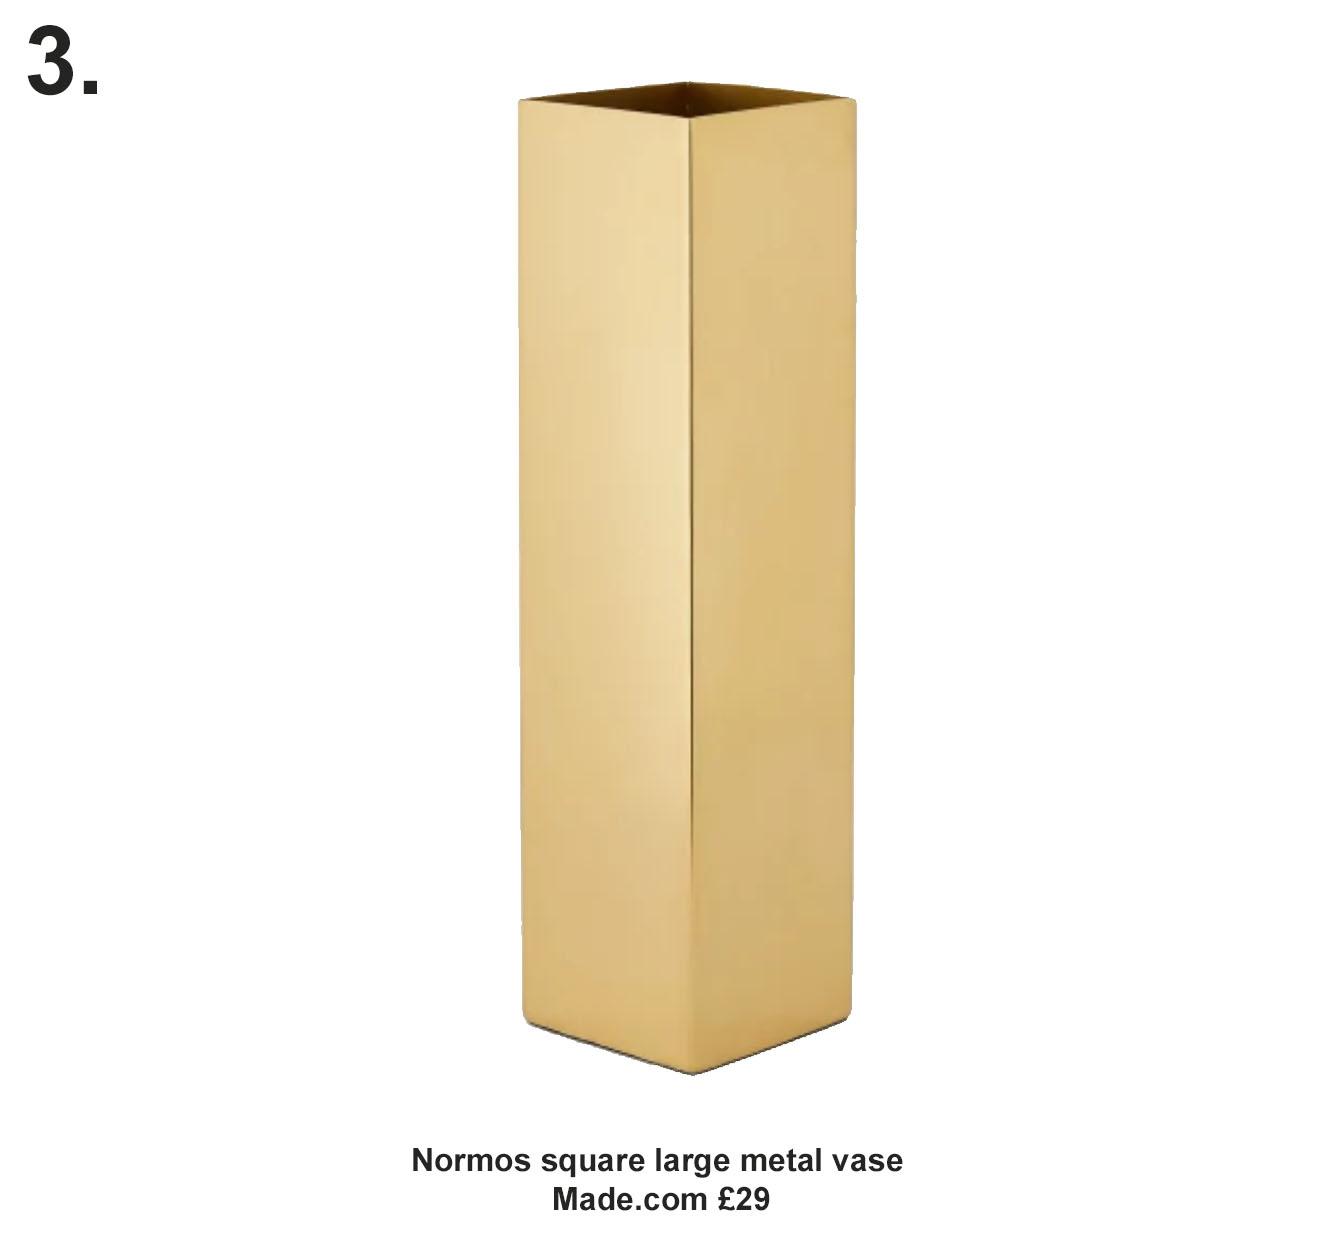 Normos square large metal vase- made.com £29